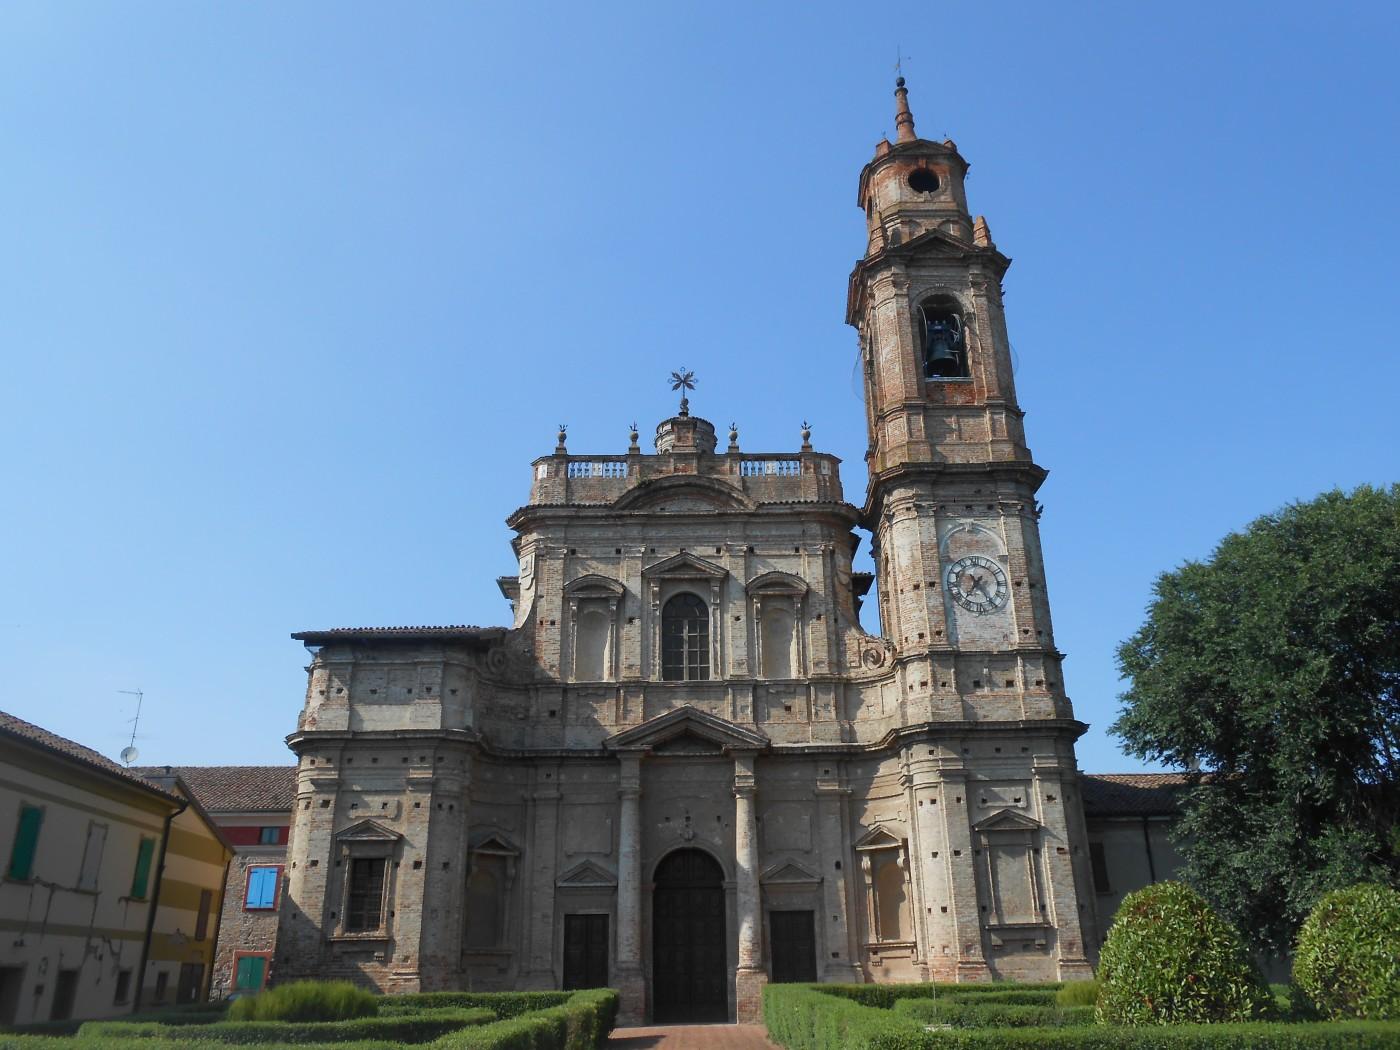 chiesa di Sant'Antonio Abate, Villa Pasquali, Sabbioneta, Antonio Galli da Bibbiena